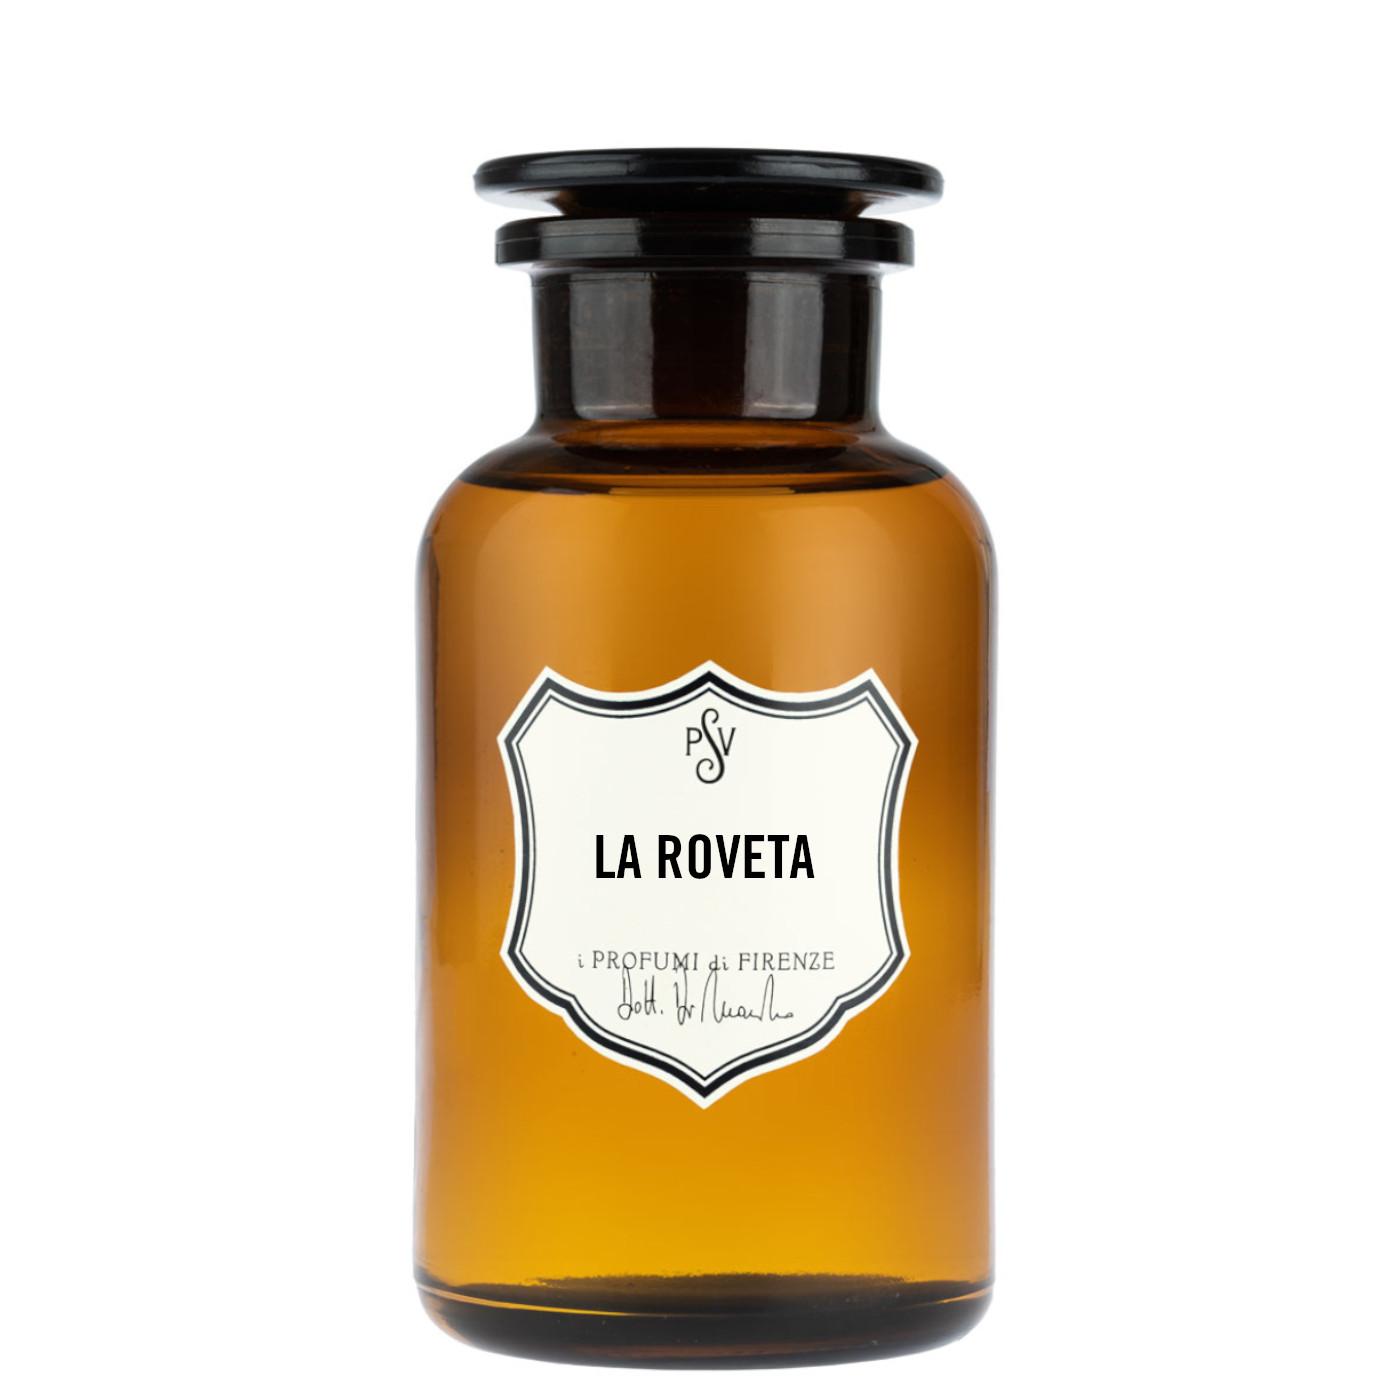 LA ROVETA - Home Fragrance-4447